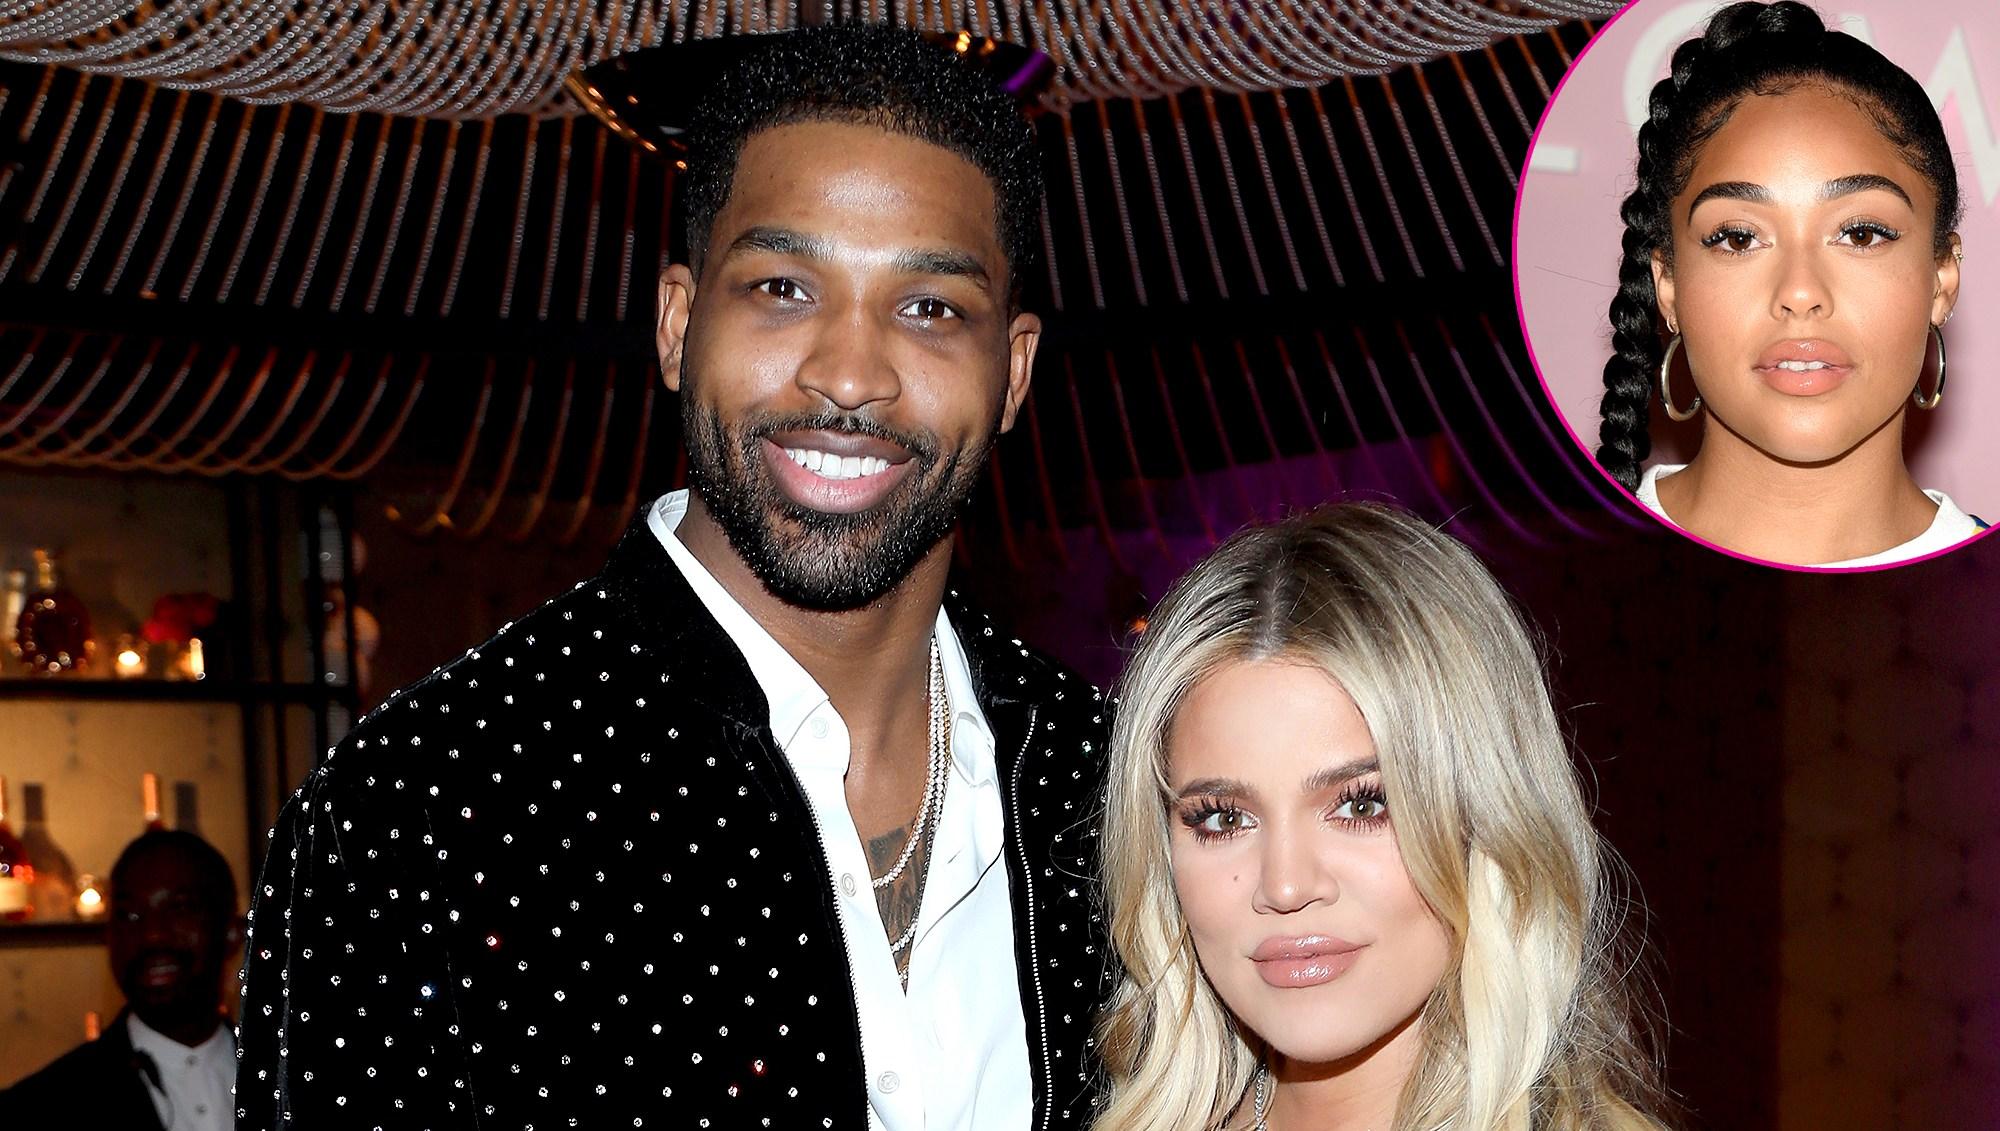 Khloe-Kardashian-and-Tristan-Thompson-Attended-Jordyn-Woods'-21st-Birthday-Party